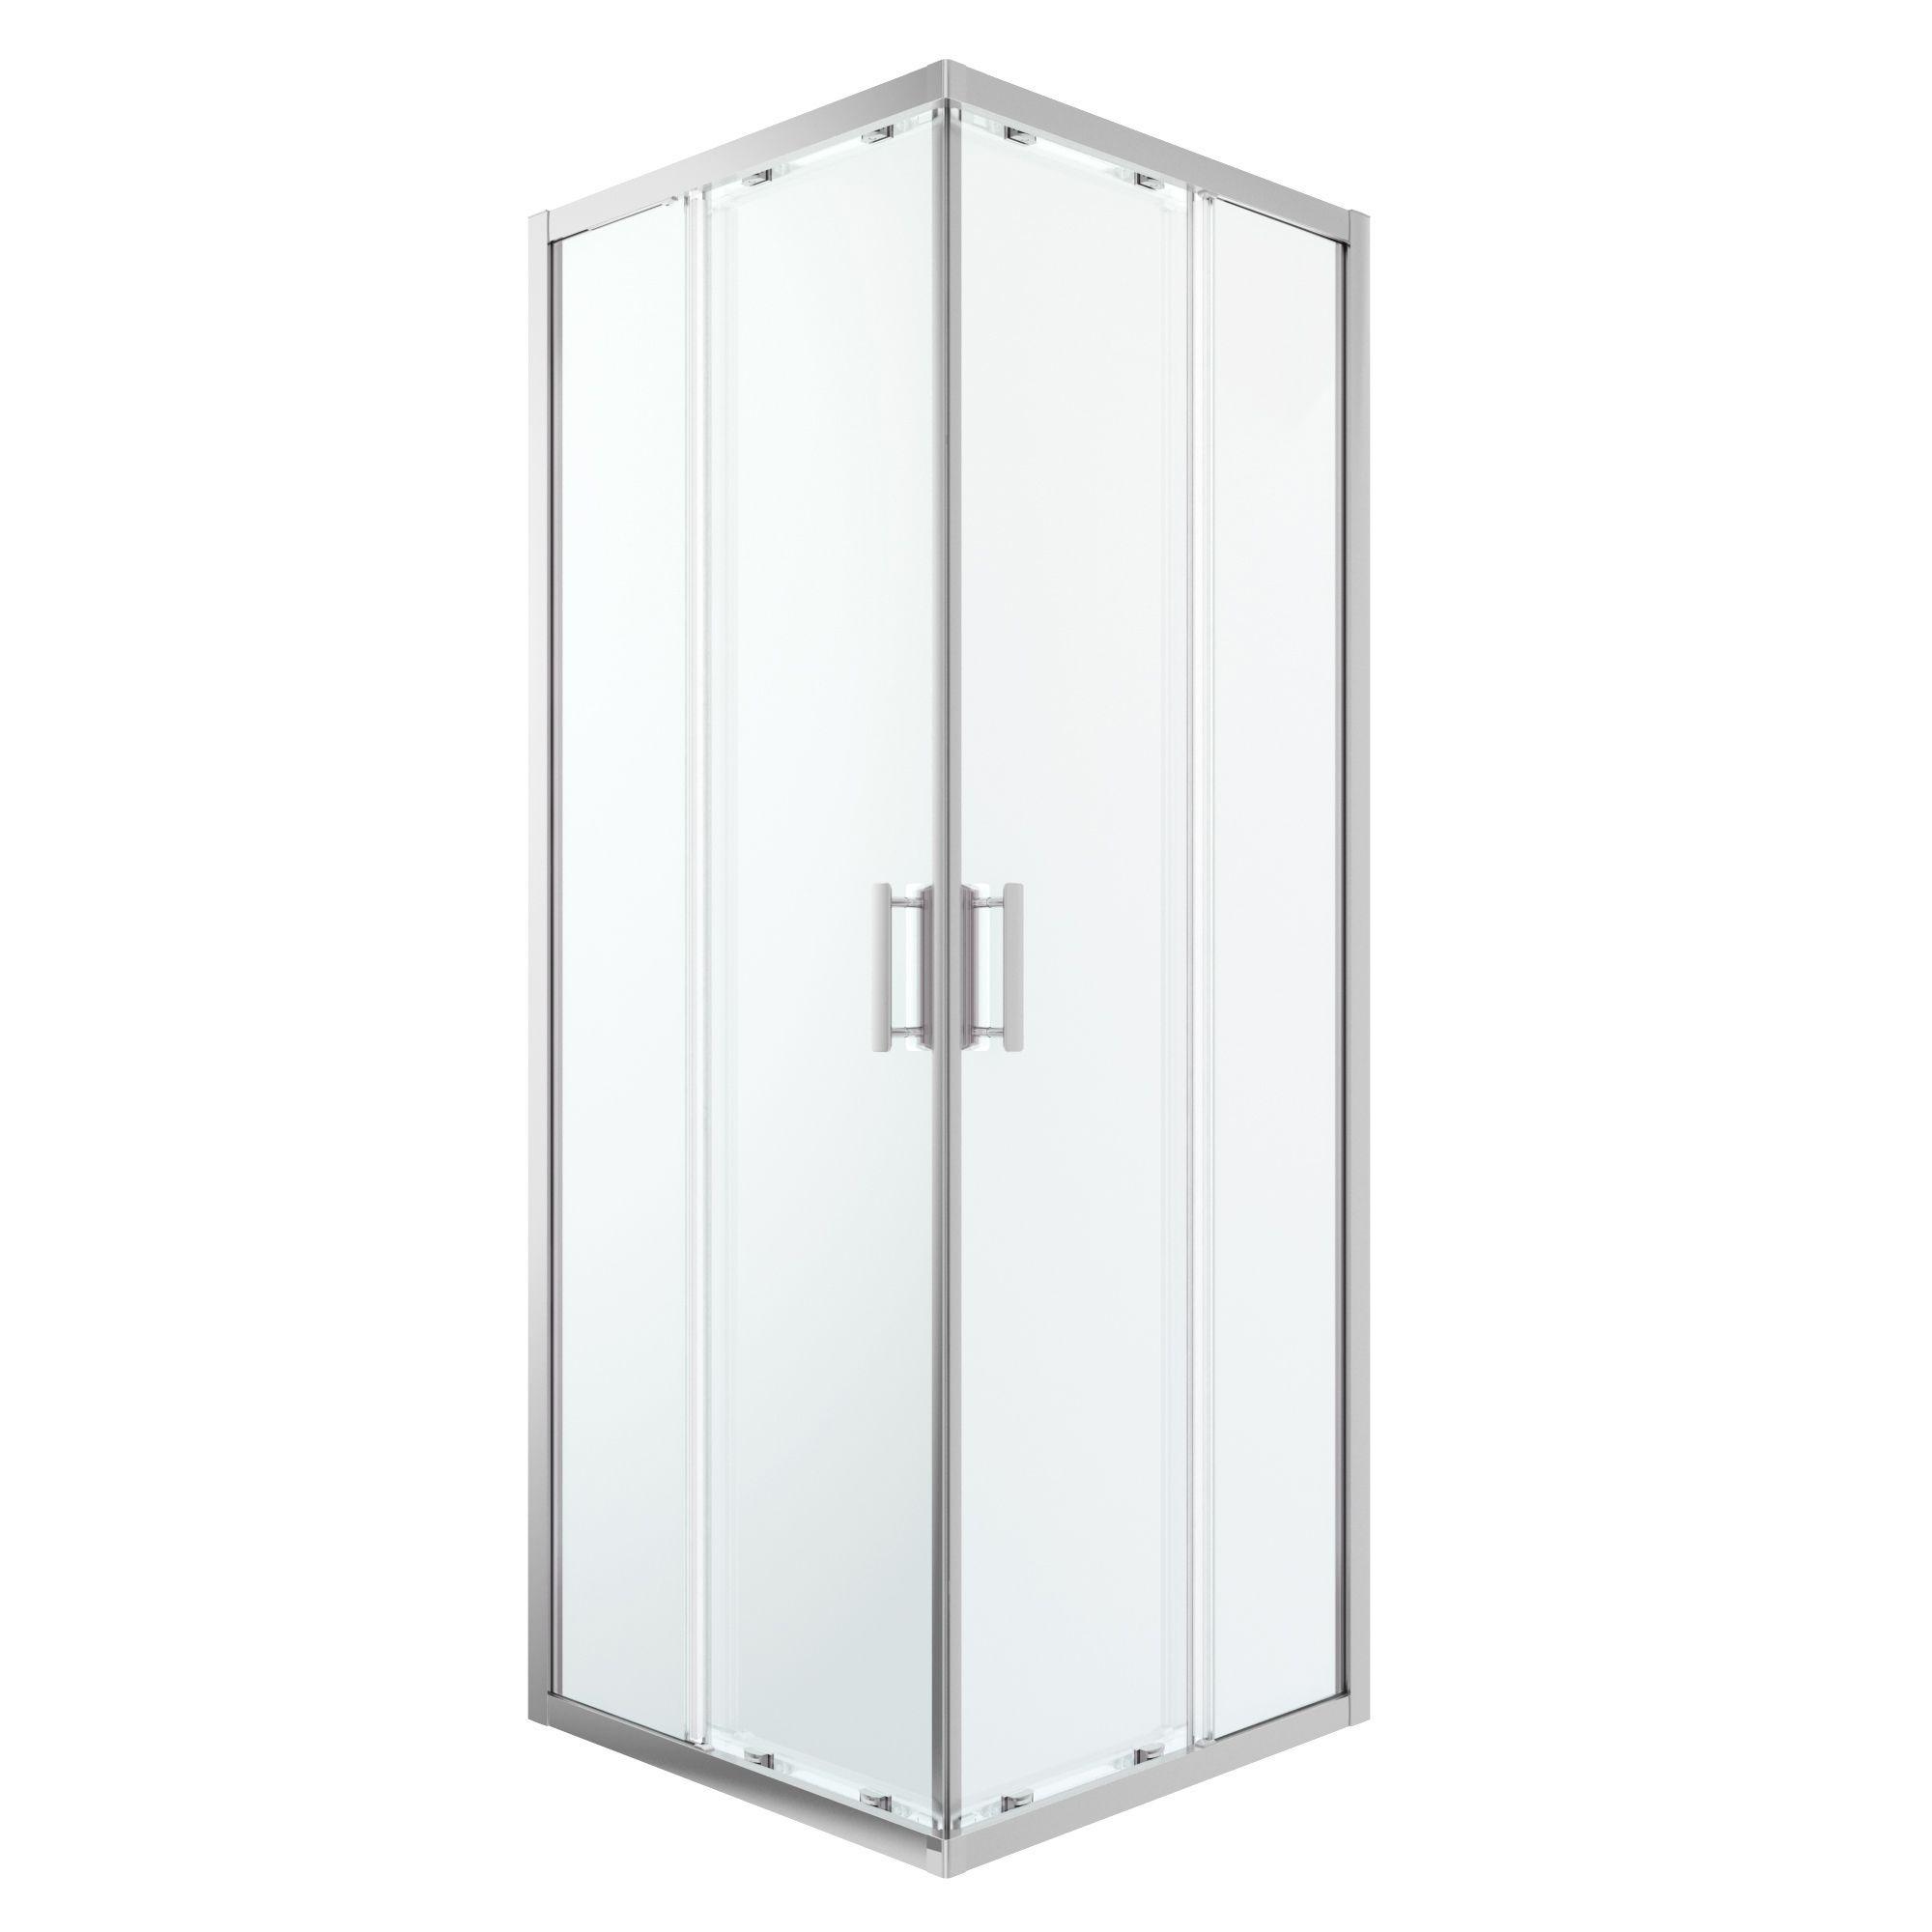 Cooke & Lewis Beloya Square Shower Enclosure With Corner Entry Double Sliding Door (w)760mm (d)760mm